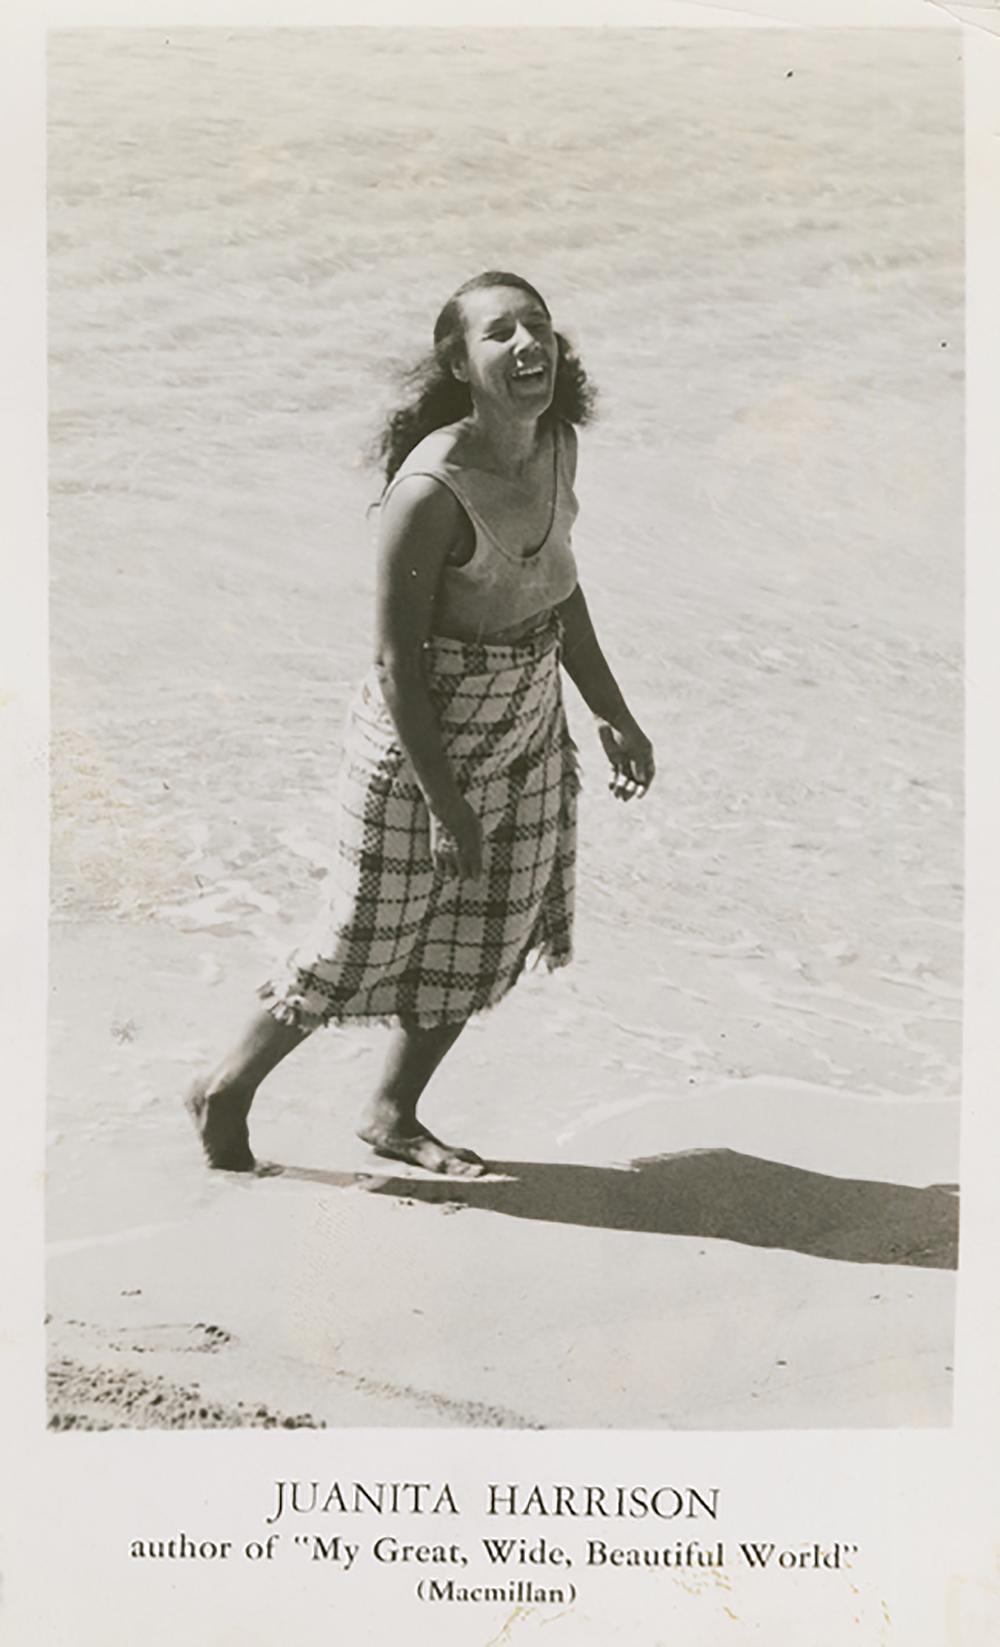 Portrait of Juanita Harrison, c. 1936.